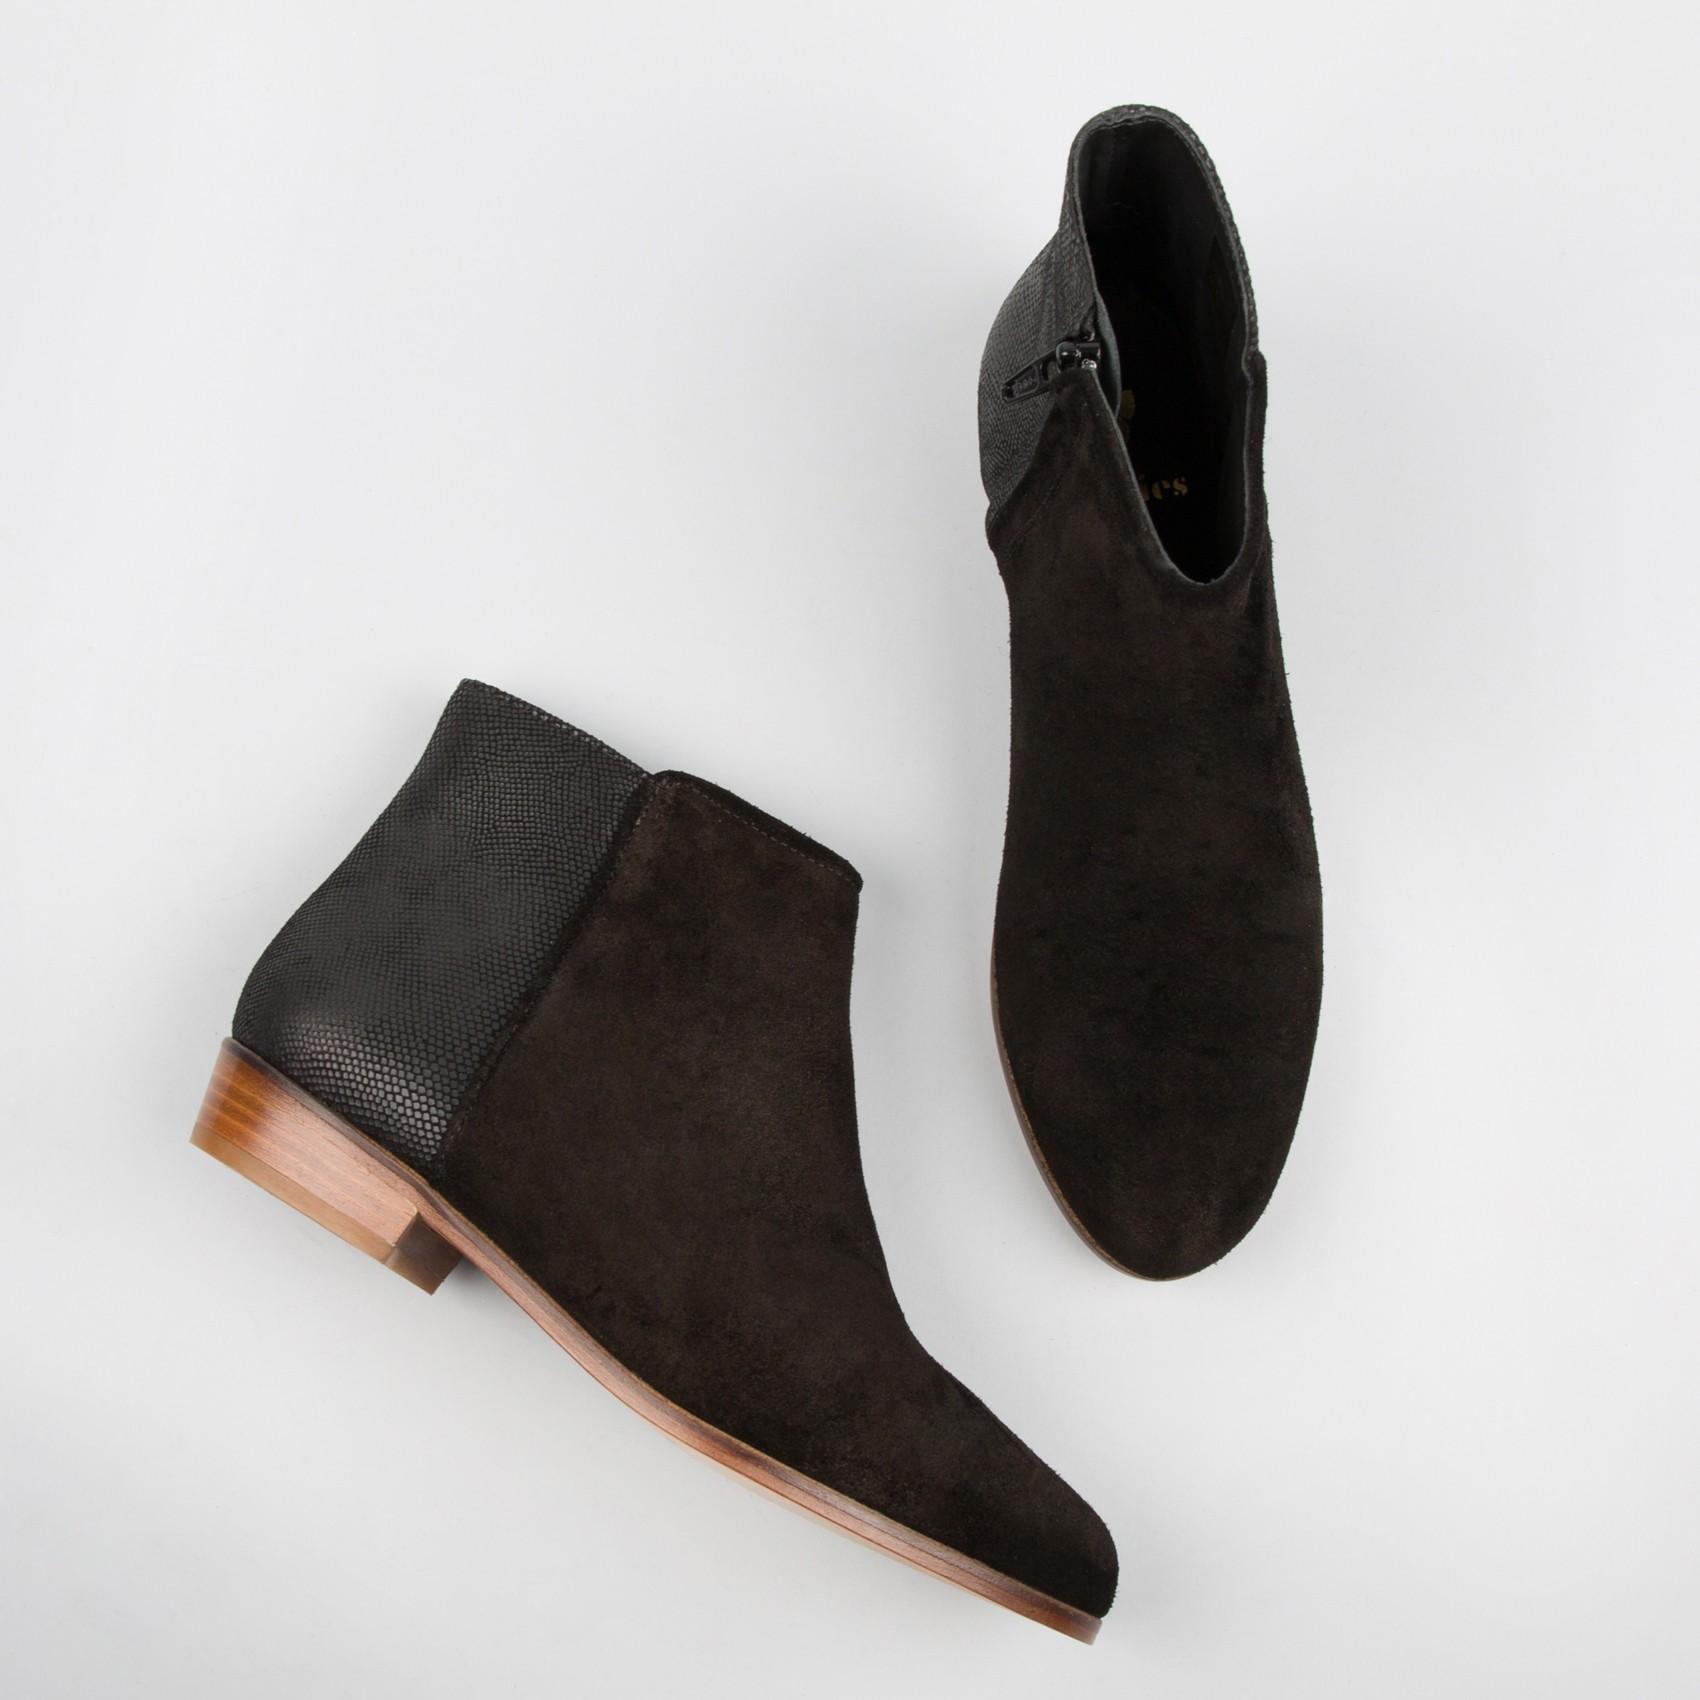 UGG classic short noir taille 6